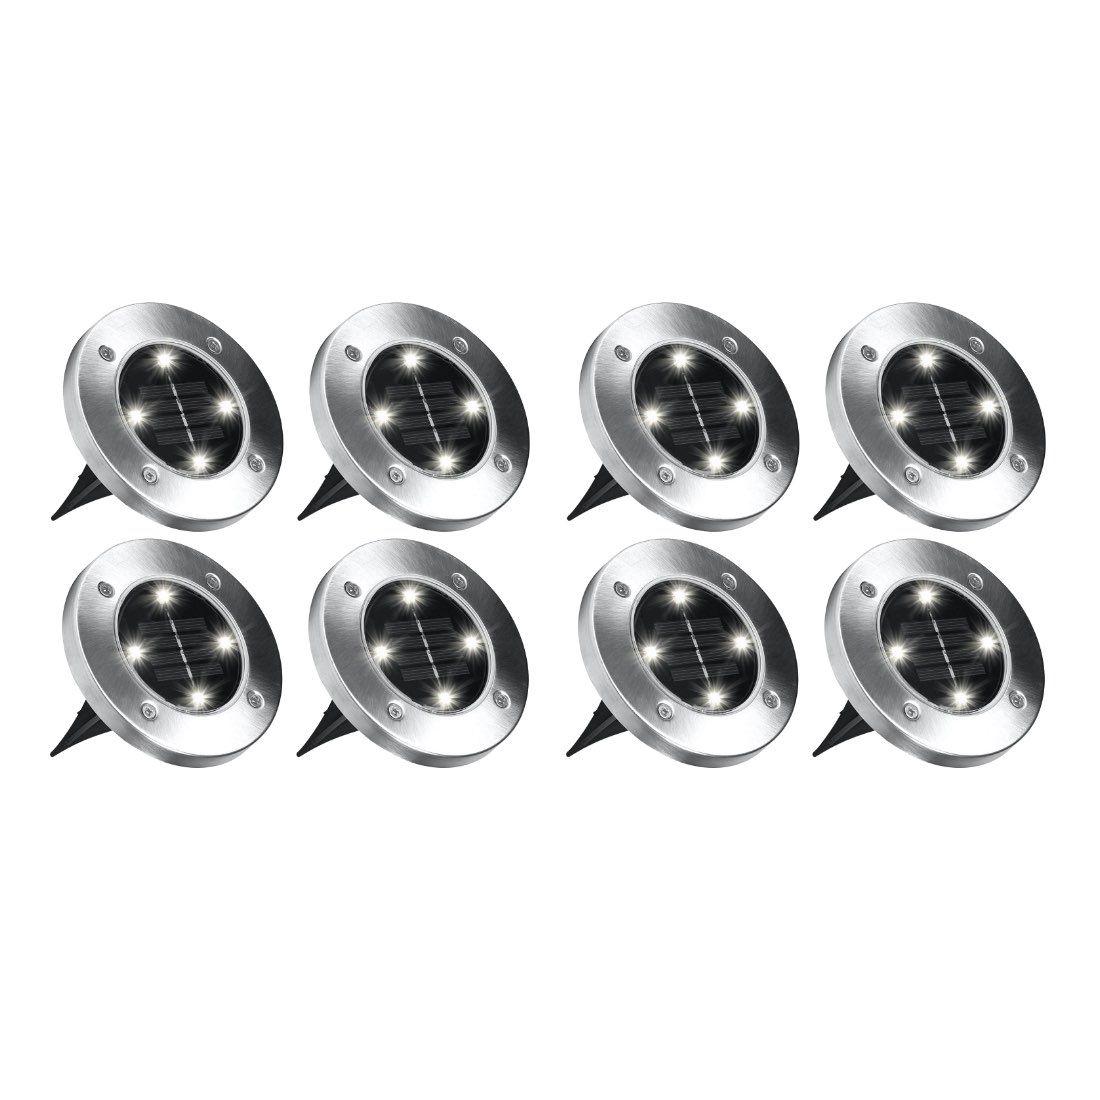 Disk Lights – 8x Solar-Powered Outdoor Lights